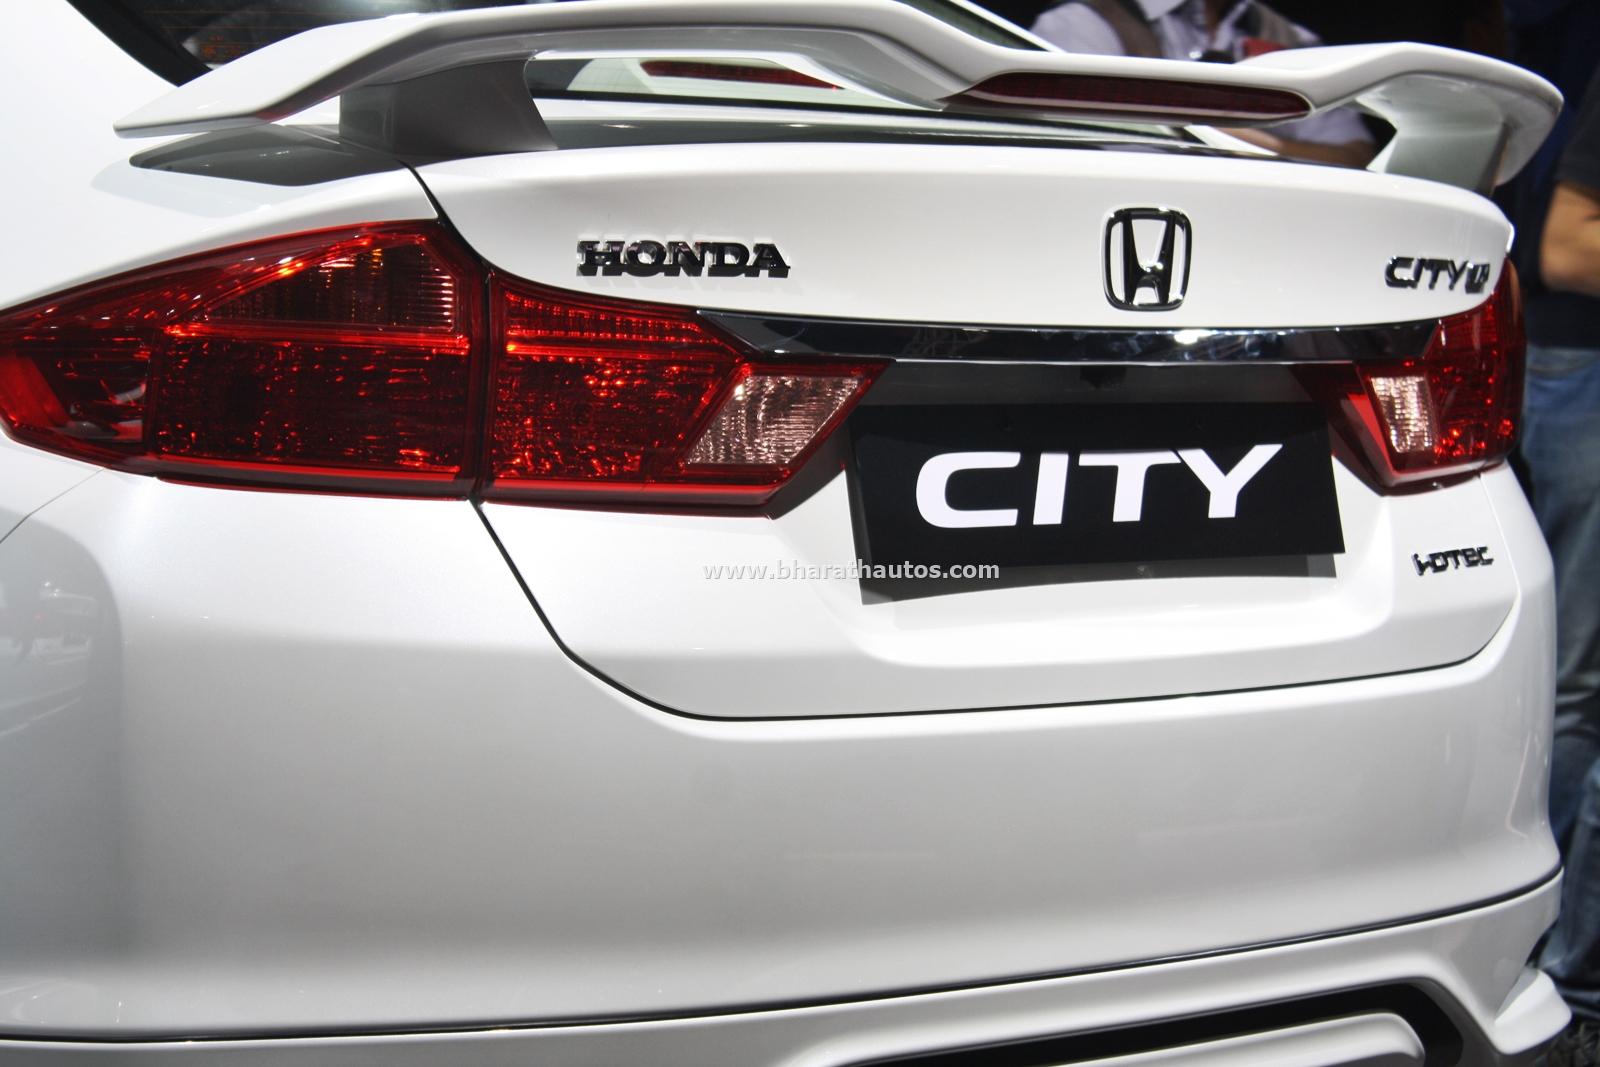 honda city black interior sports kit accessories pictures